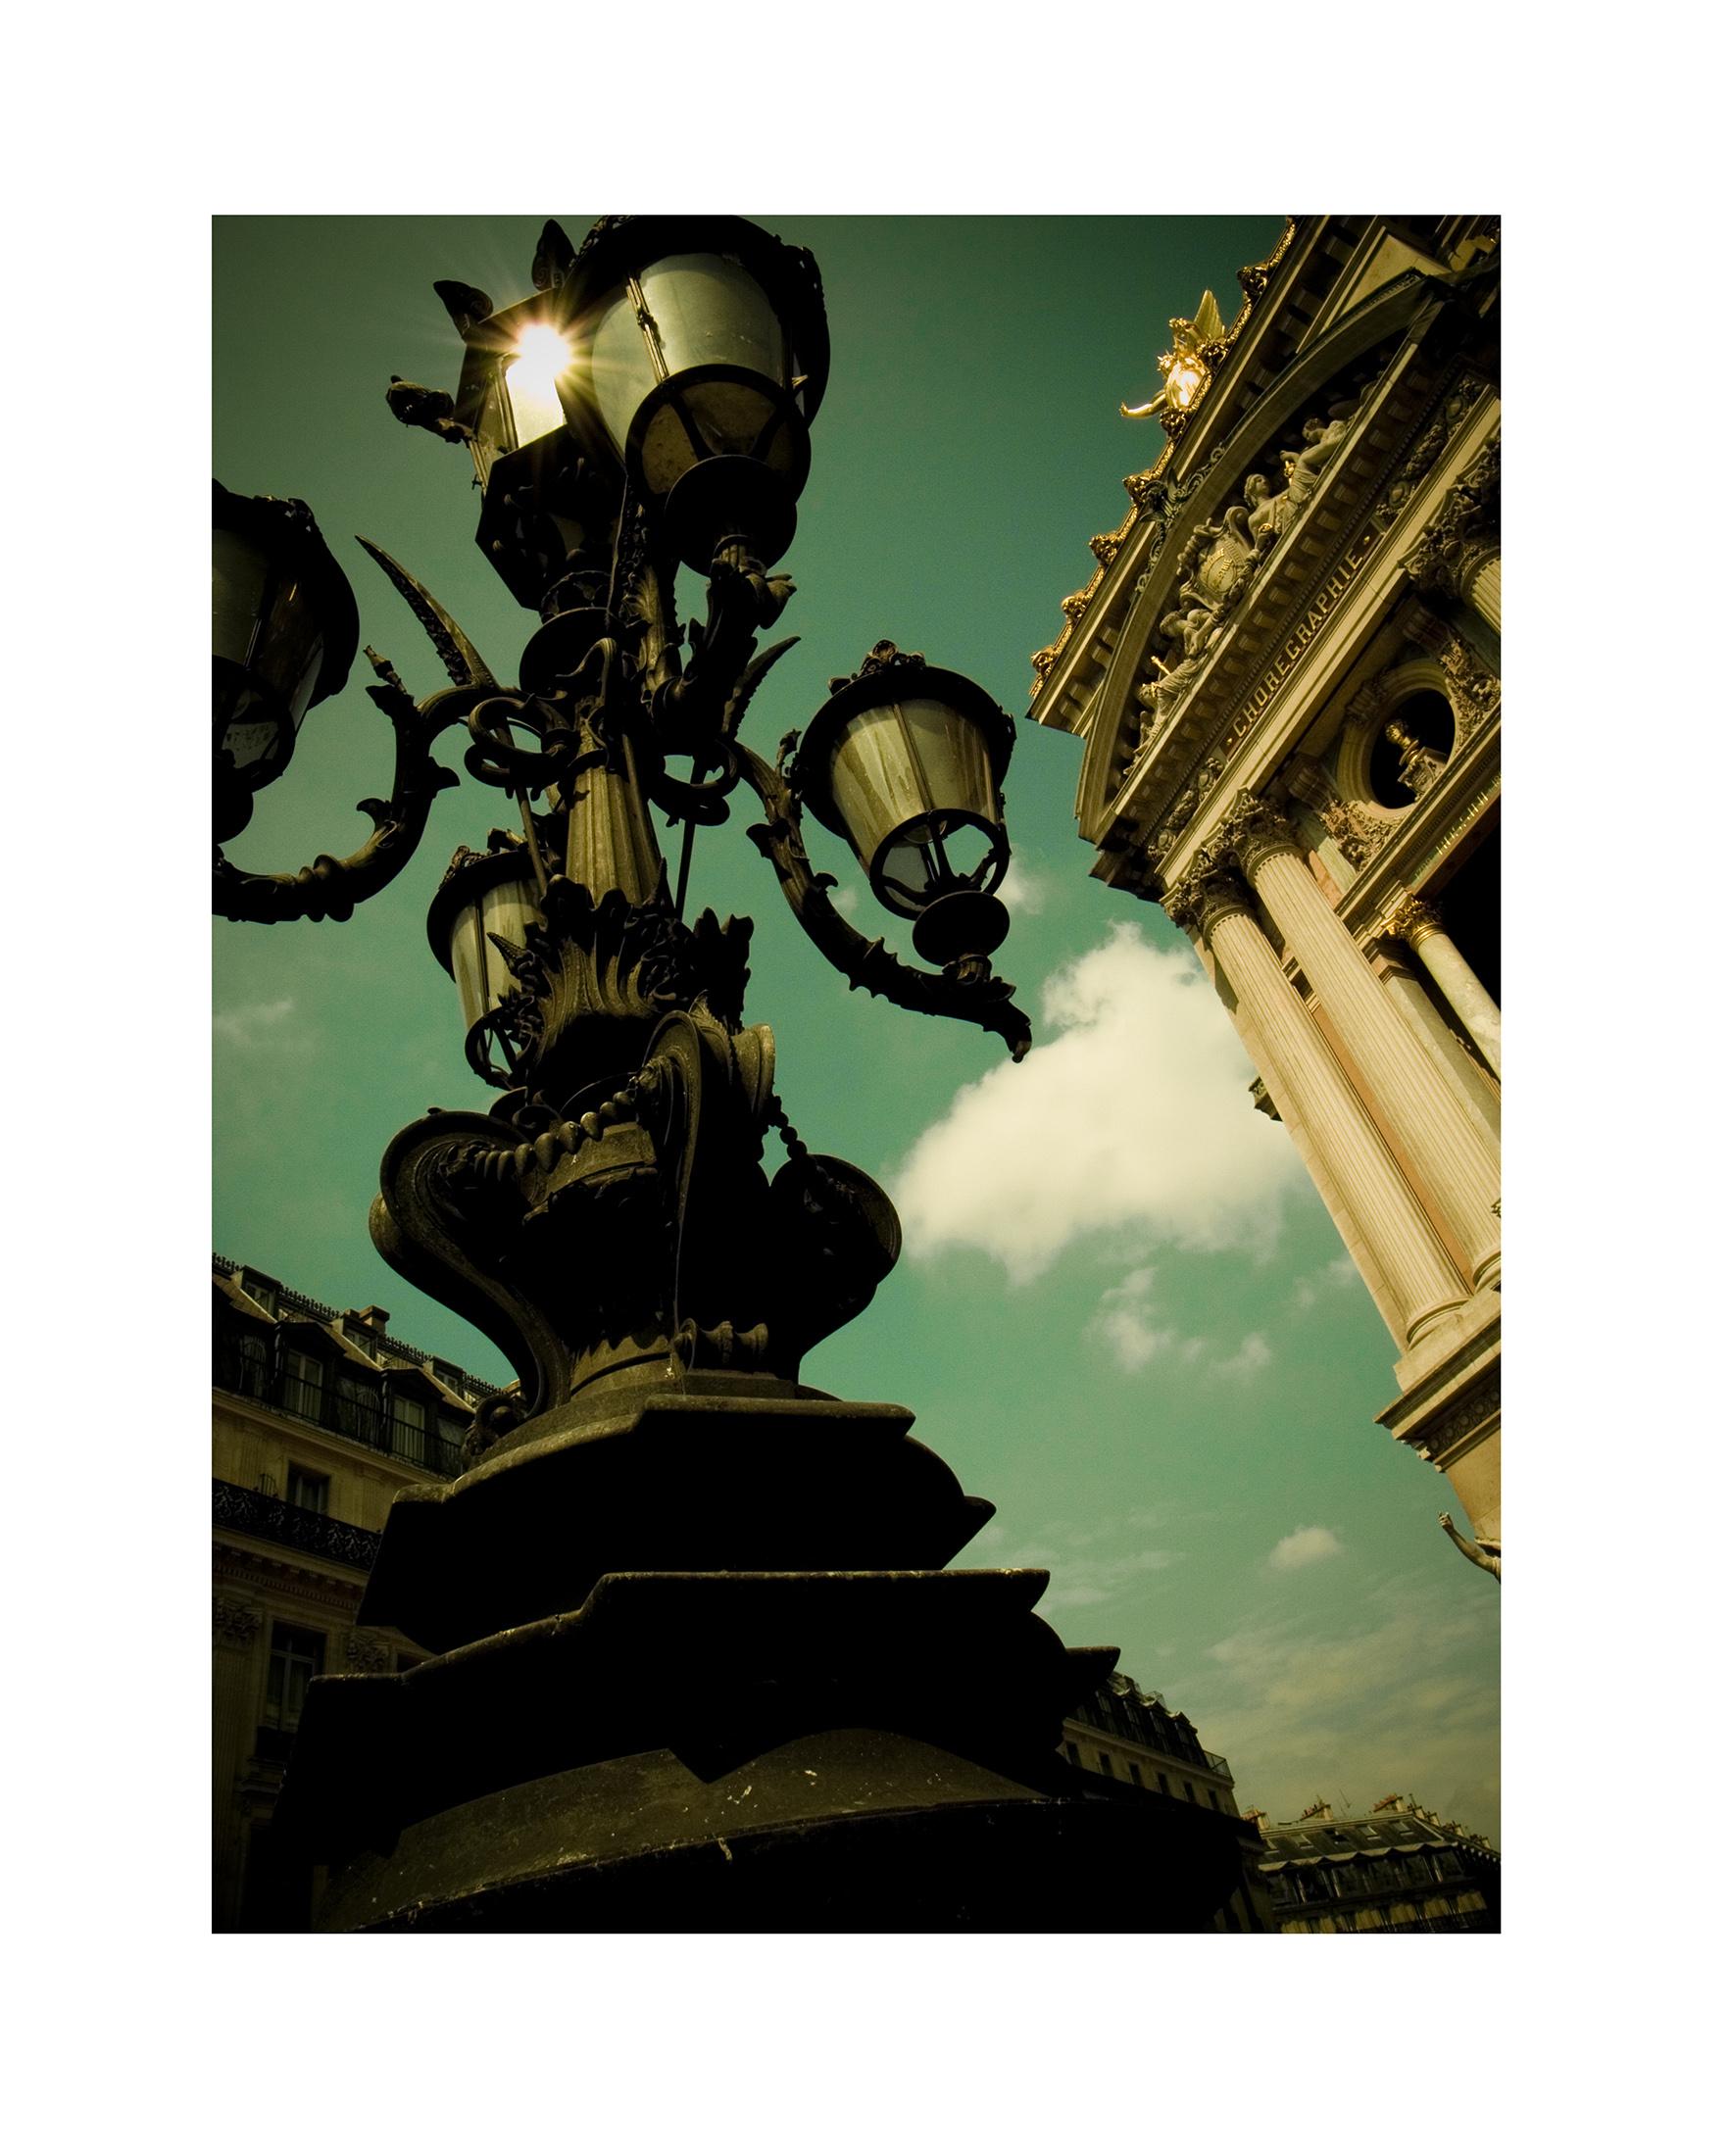 Paris_MG_5752.jpg